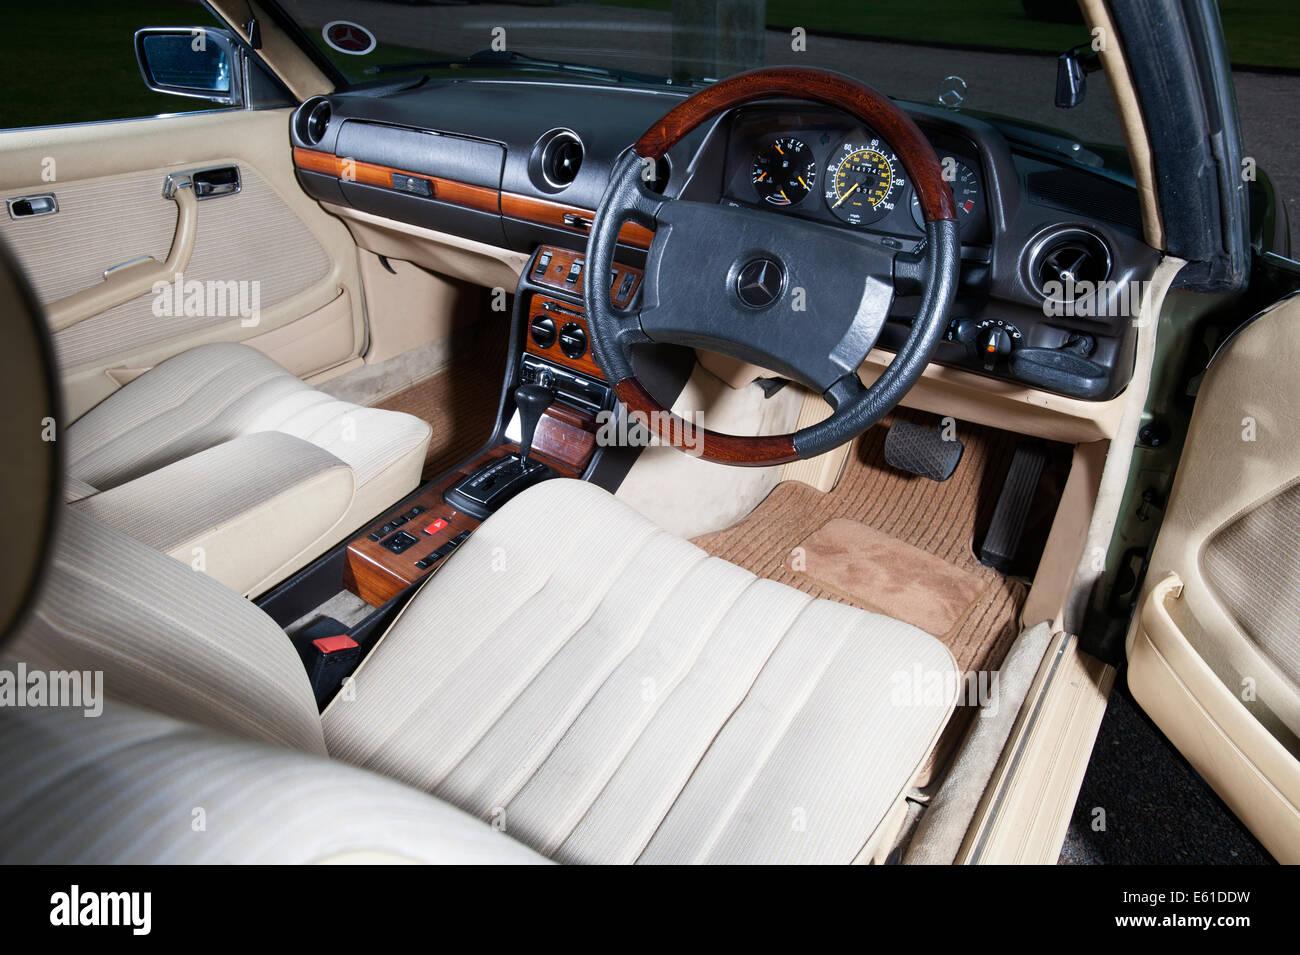 1980 mercedes 280ce e class coupe luxury german car interior stock photo 72561941 alamy - Mercedes e coupe interior ...